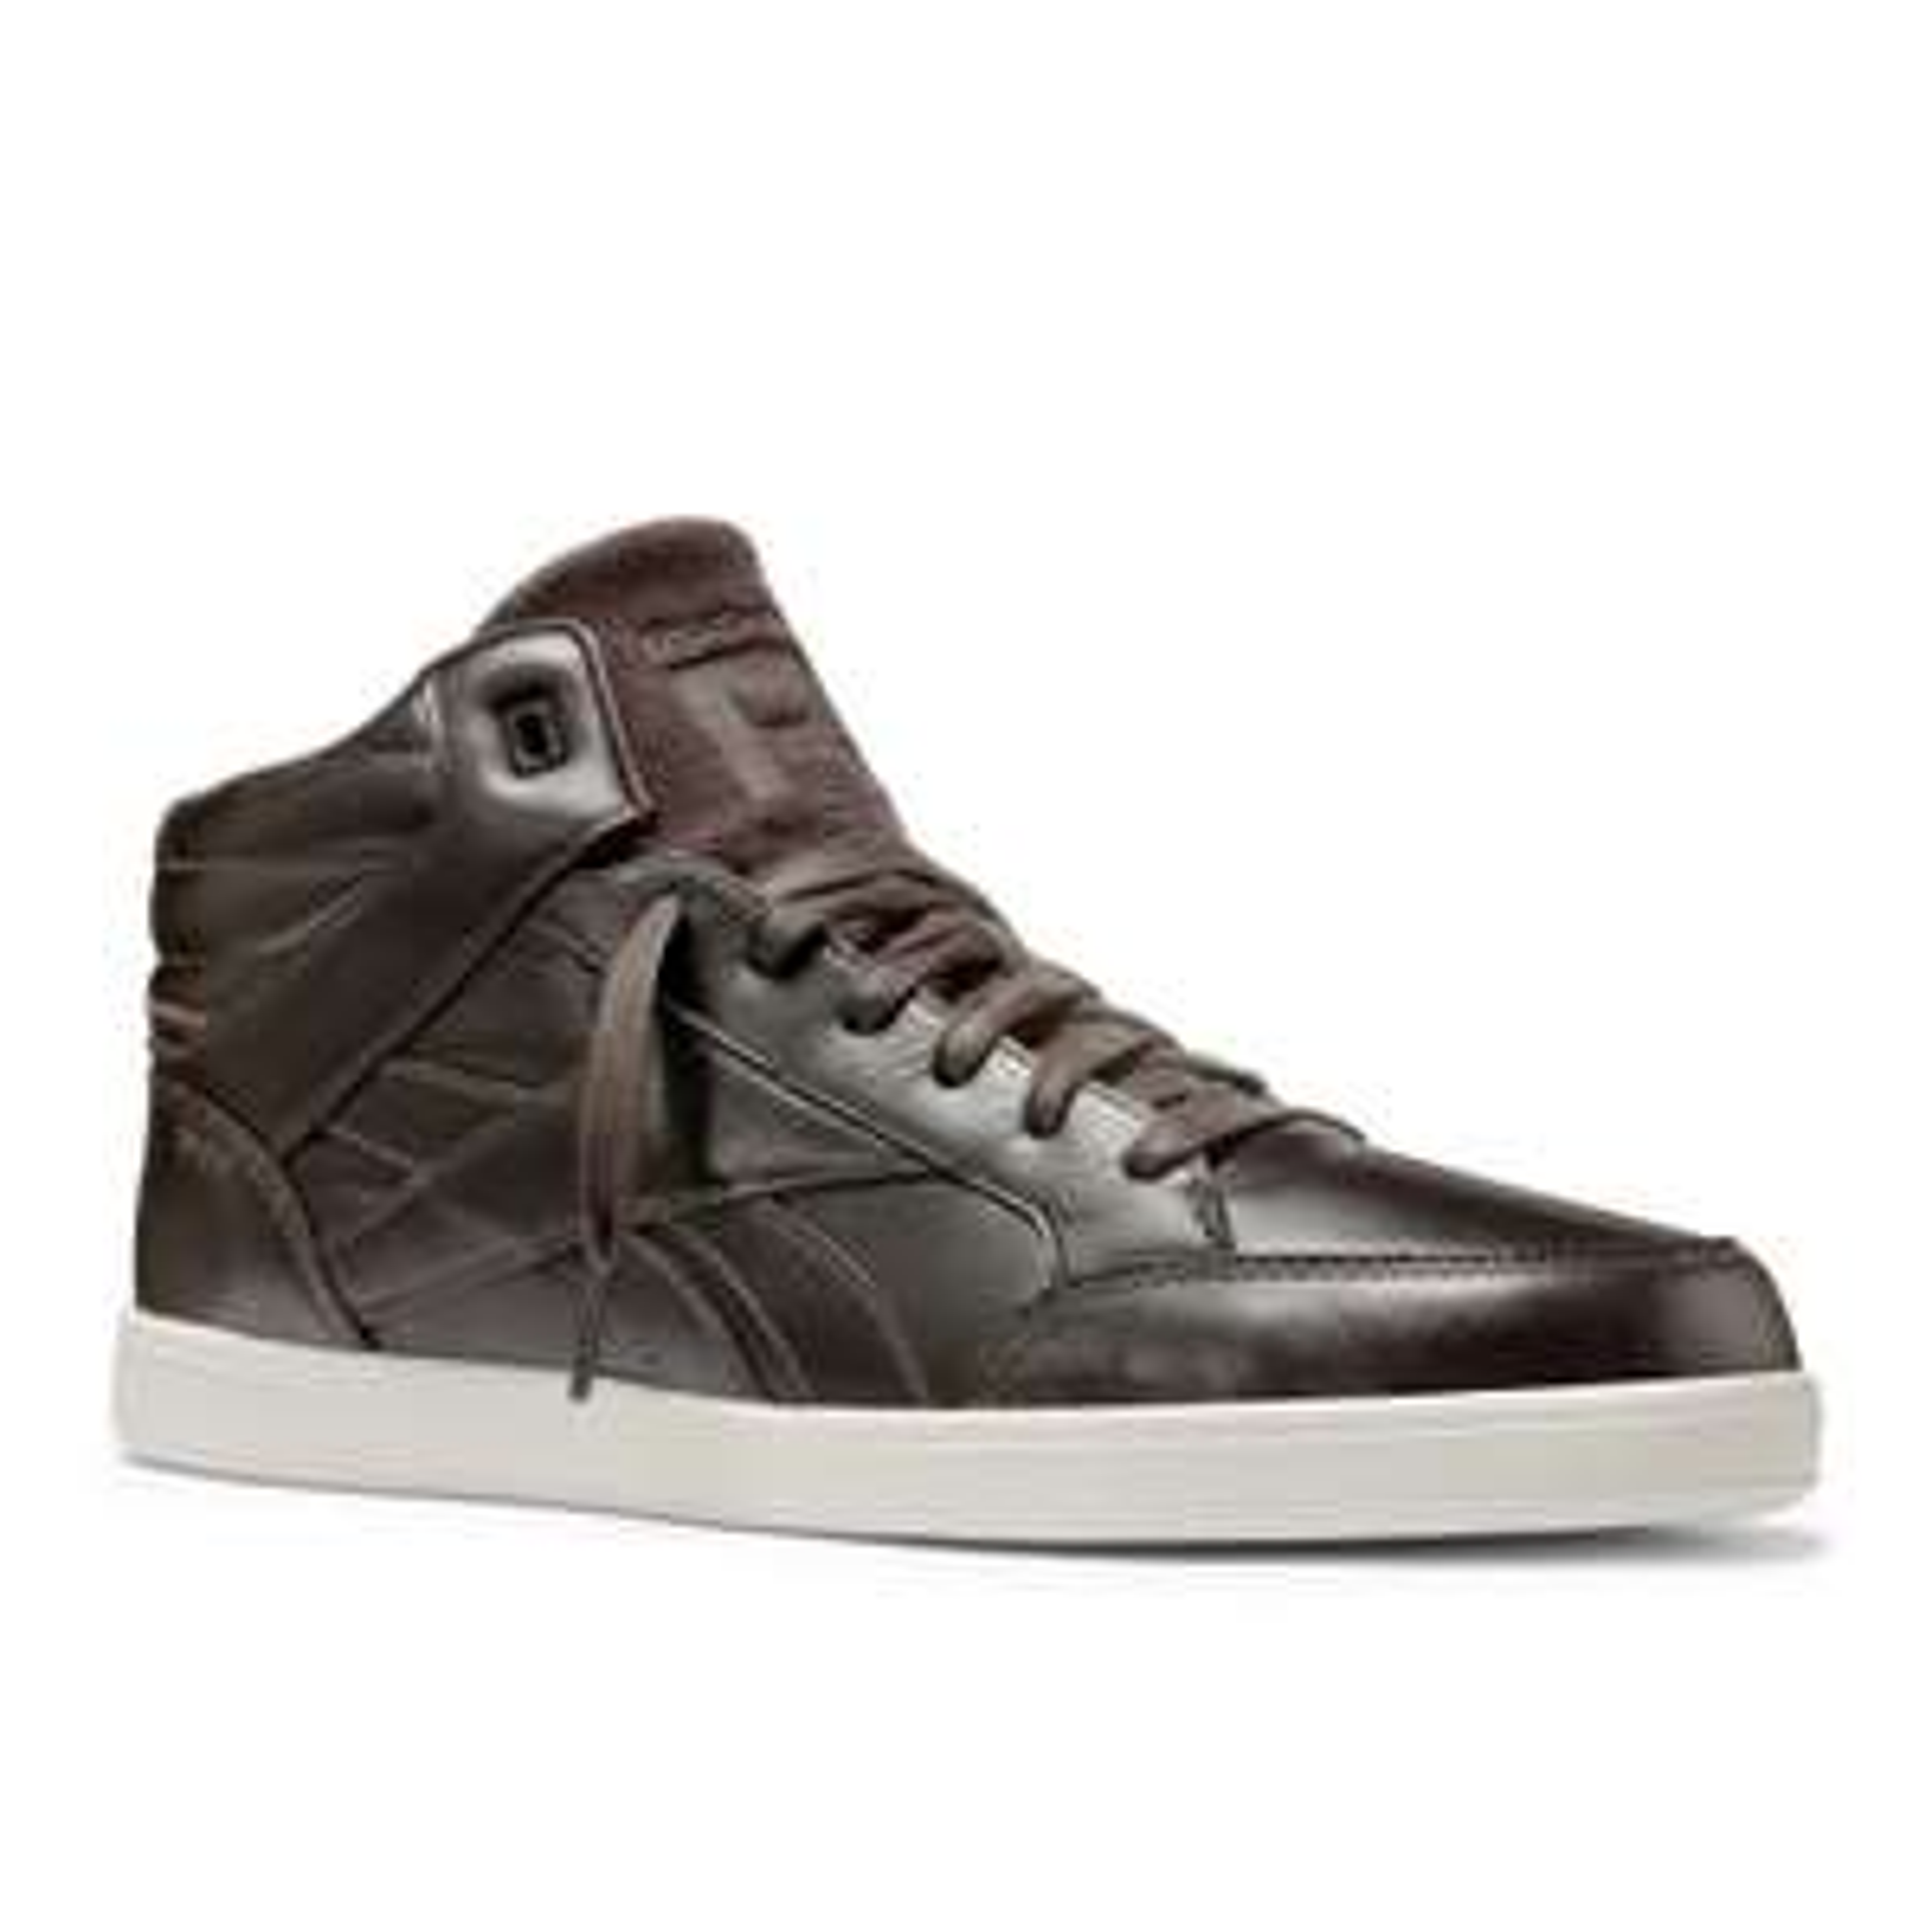 Chaussures Reebok SH 311 cuir et nubuck - marron ou noir